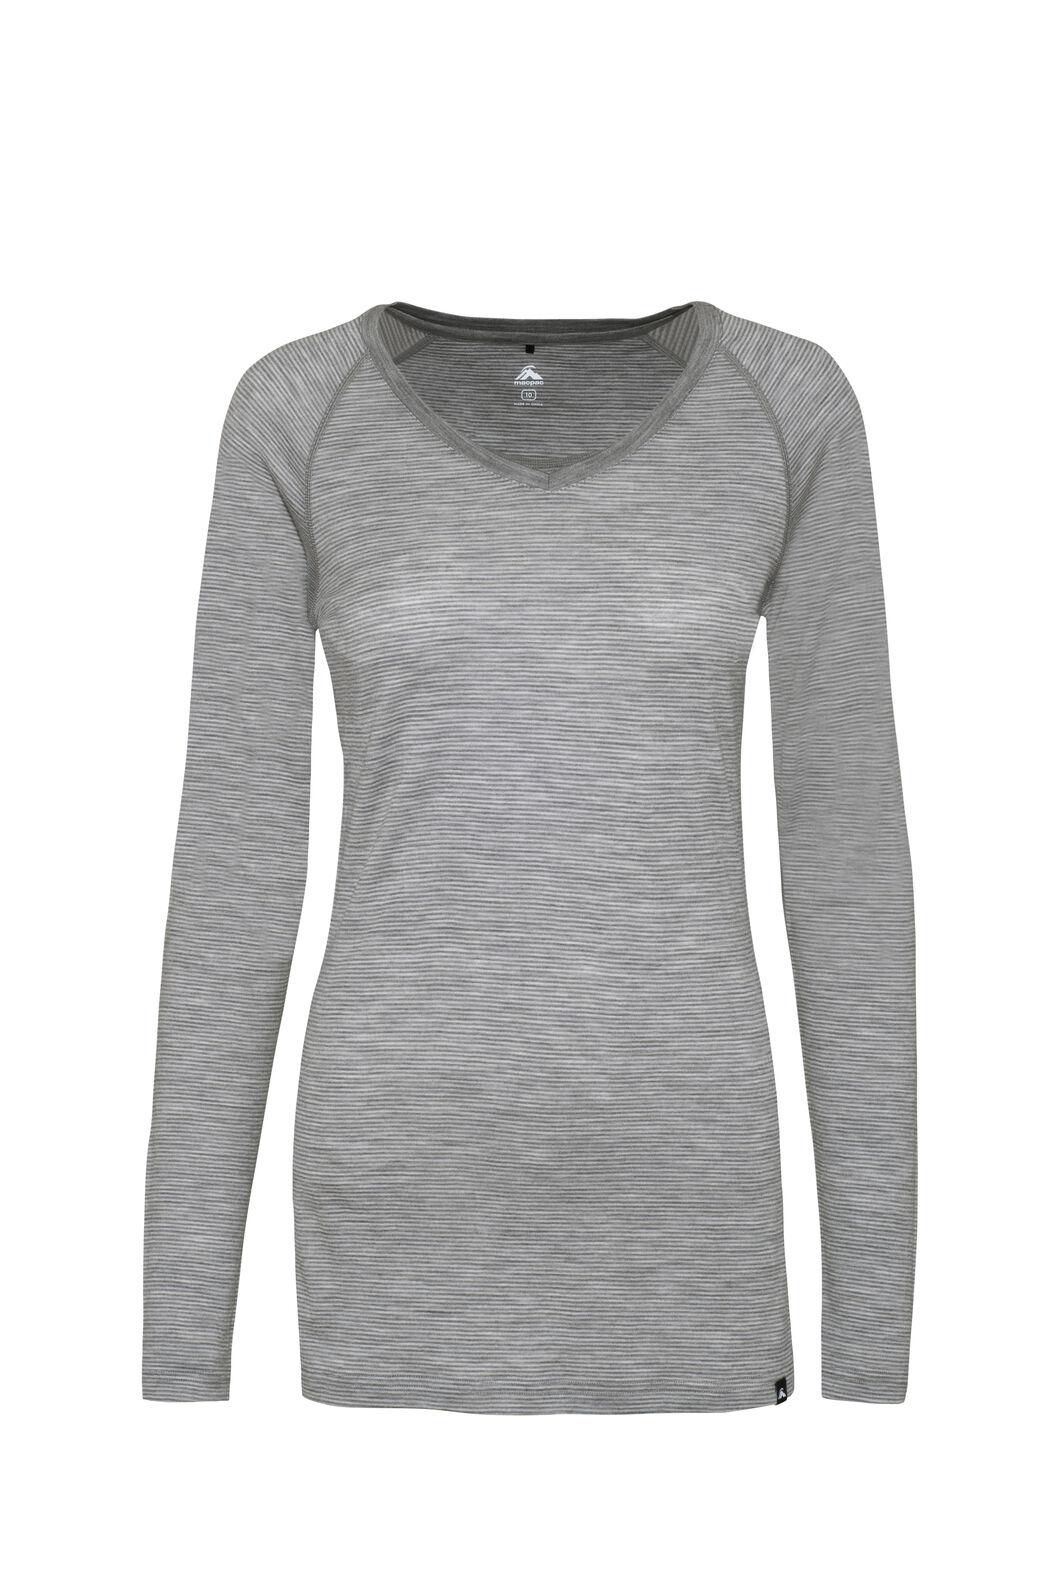 Macpac 150 Merino V-Neck Top — Women's, Light Grey Stripe, hi-res